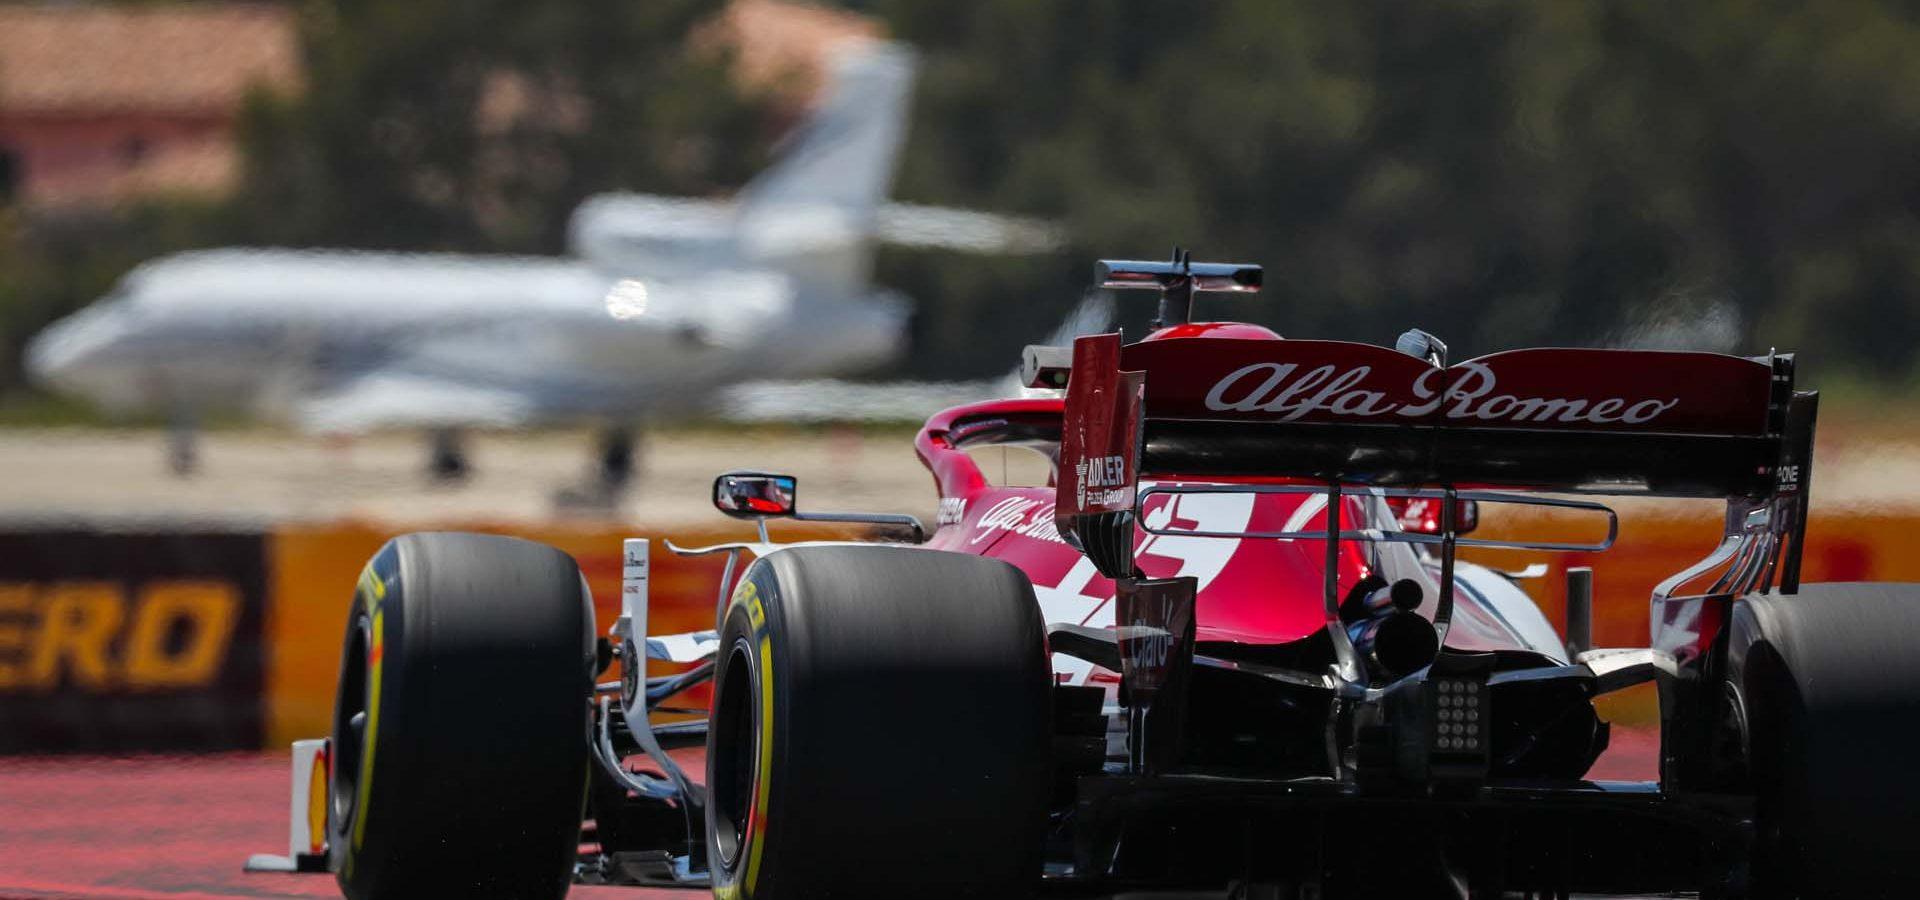 07 RAIKKONEN Kimi (fin), Alfa Romeo Racing C38, action during the 2019 Formula One World Championship, France Grand Prix  on june  20 to 23 at Le Castellet - Photo Antonin Vincent / DPPI Räikkönen